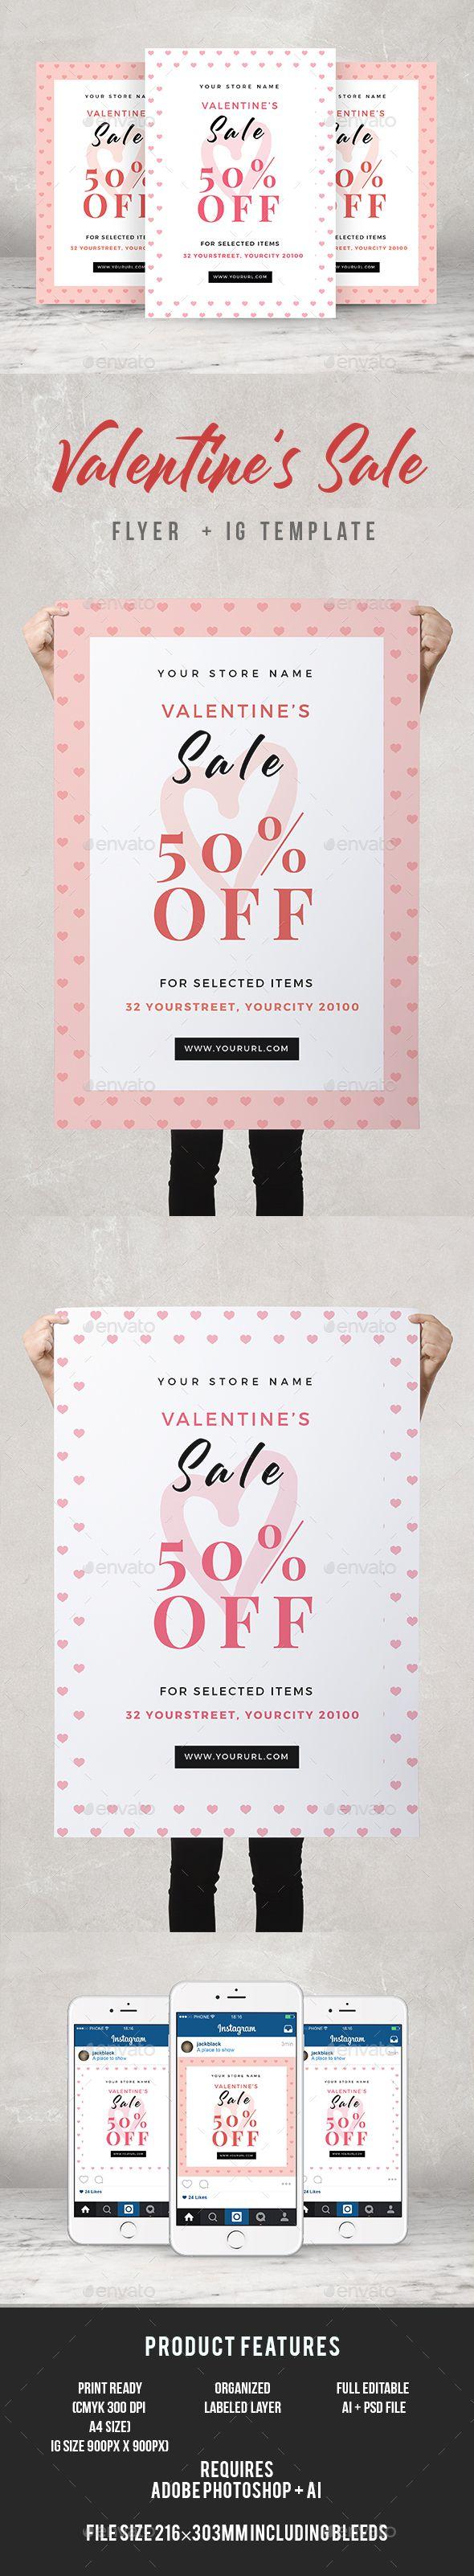 Valentines Sale Flyer #store #red • Download ➝ https://graphicriver.net/item/valentines-sale-flyer/21339734?ref=pxcr